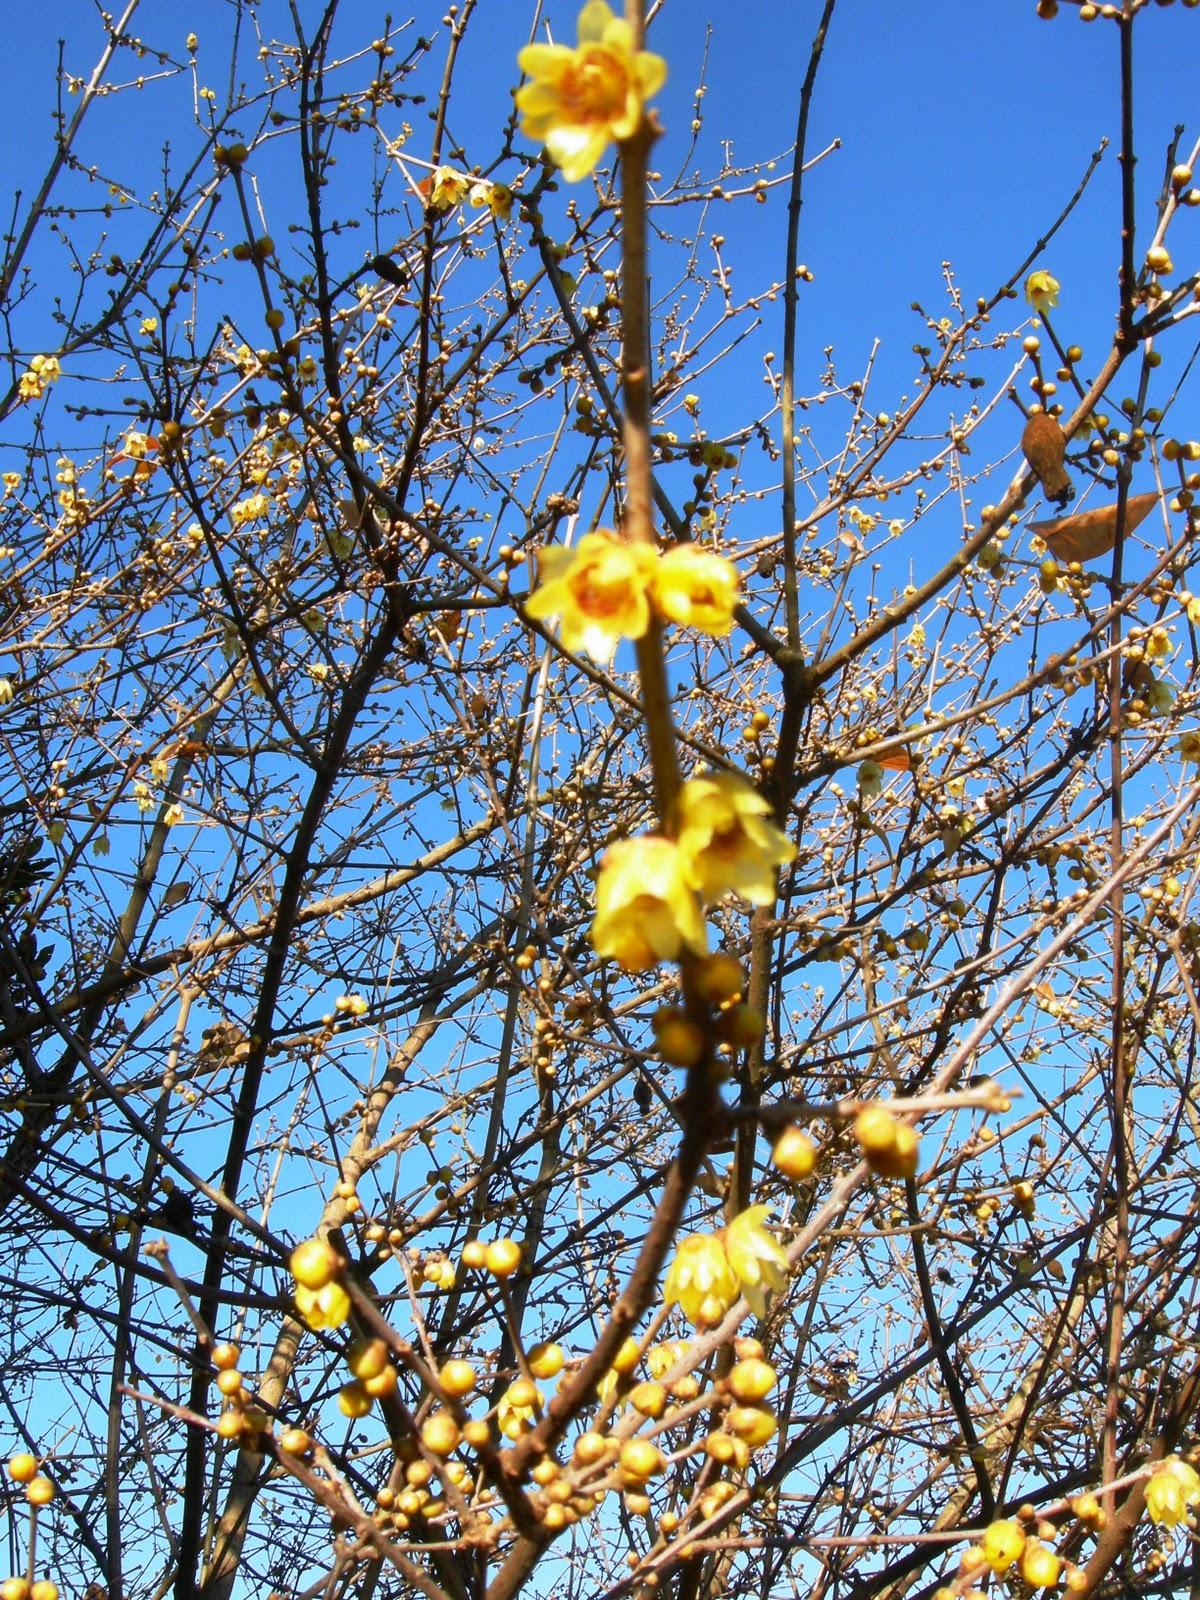 Calicanto Fiore D Inverno i dì protrar torpidi: calicanto - fiori d'inverno